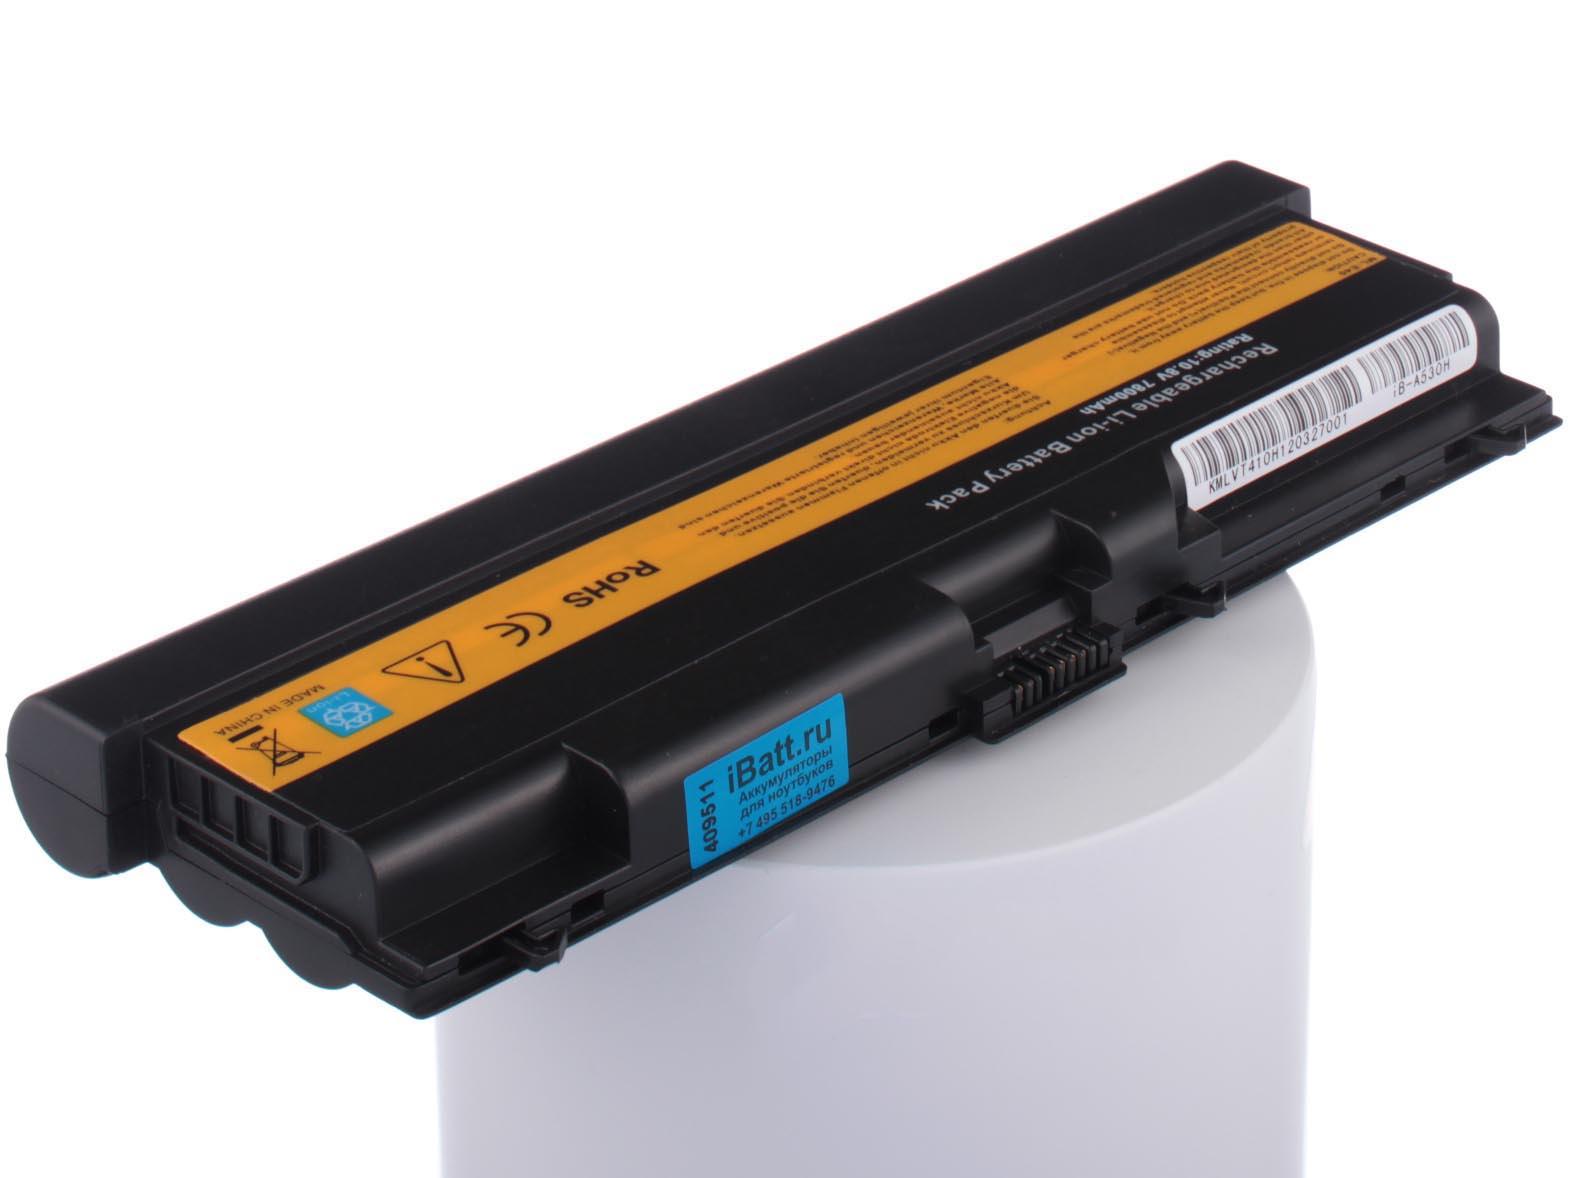 Аккумулятор для ноутбука iBatt для iBM-Lenovo ThinkPad W510, Thinkpad Edge 14 Intel, ThinkPad L512, ThinkPad L412, ThinkPad T510i, ThinkPad L410, ThinkPad SL410, E50-70, ThinkPad L510, ThinkPad Edge E420, ThinkPad Edge E520